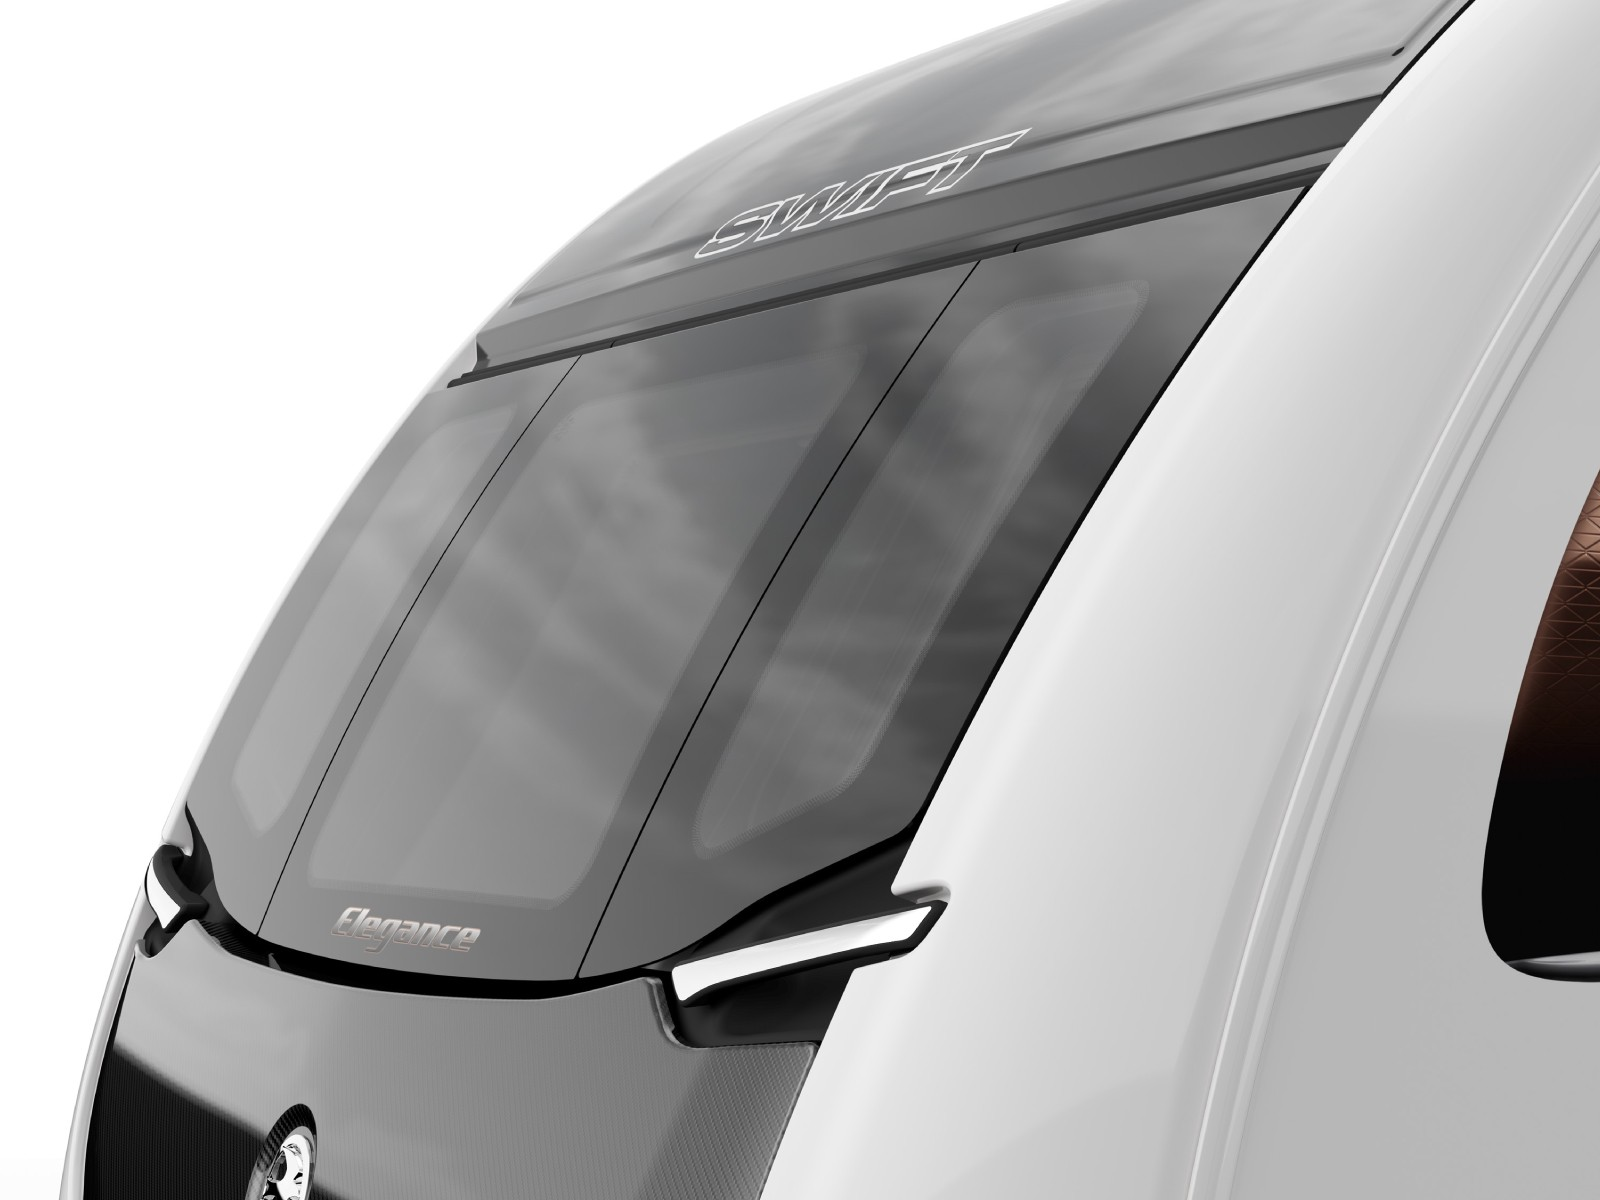 Swift Caravans Elegance External Front Windows Image